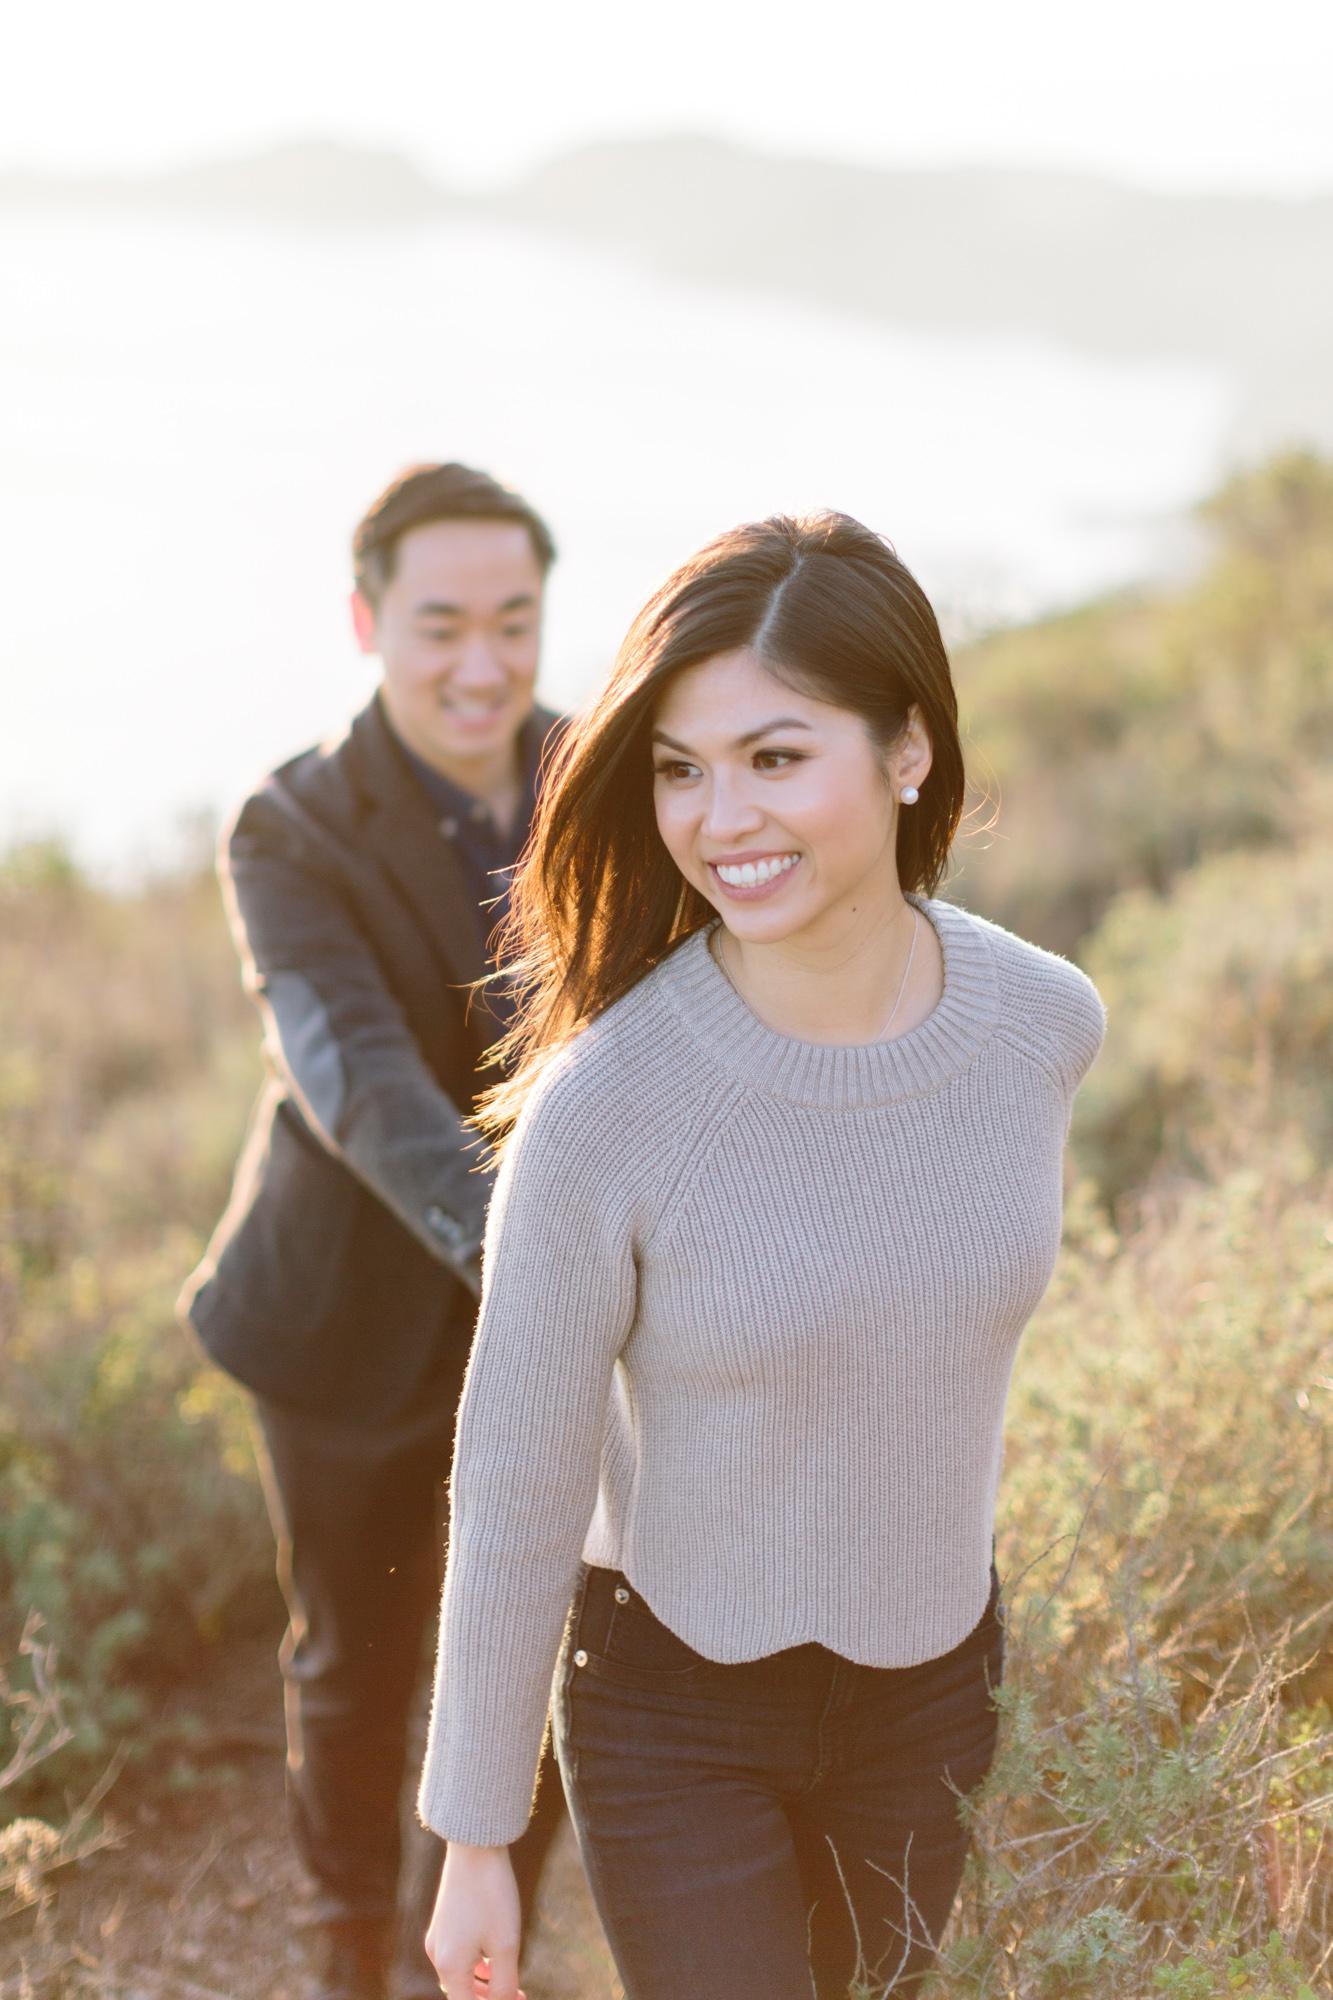 joeewong-jaal-california-san-francisco-engagement-21